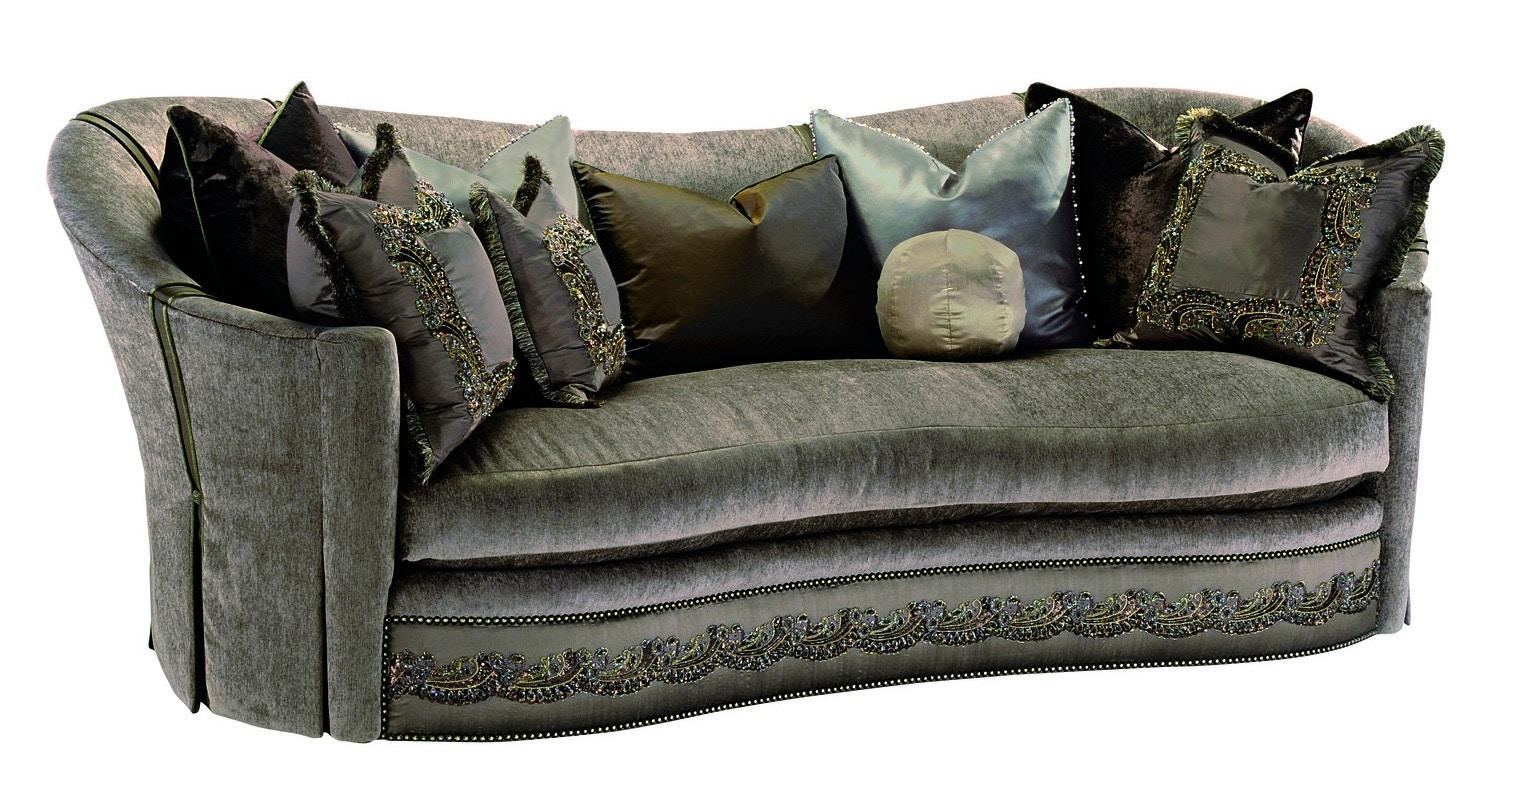 Louisiana Furniture Gallery